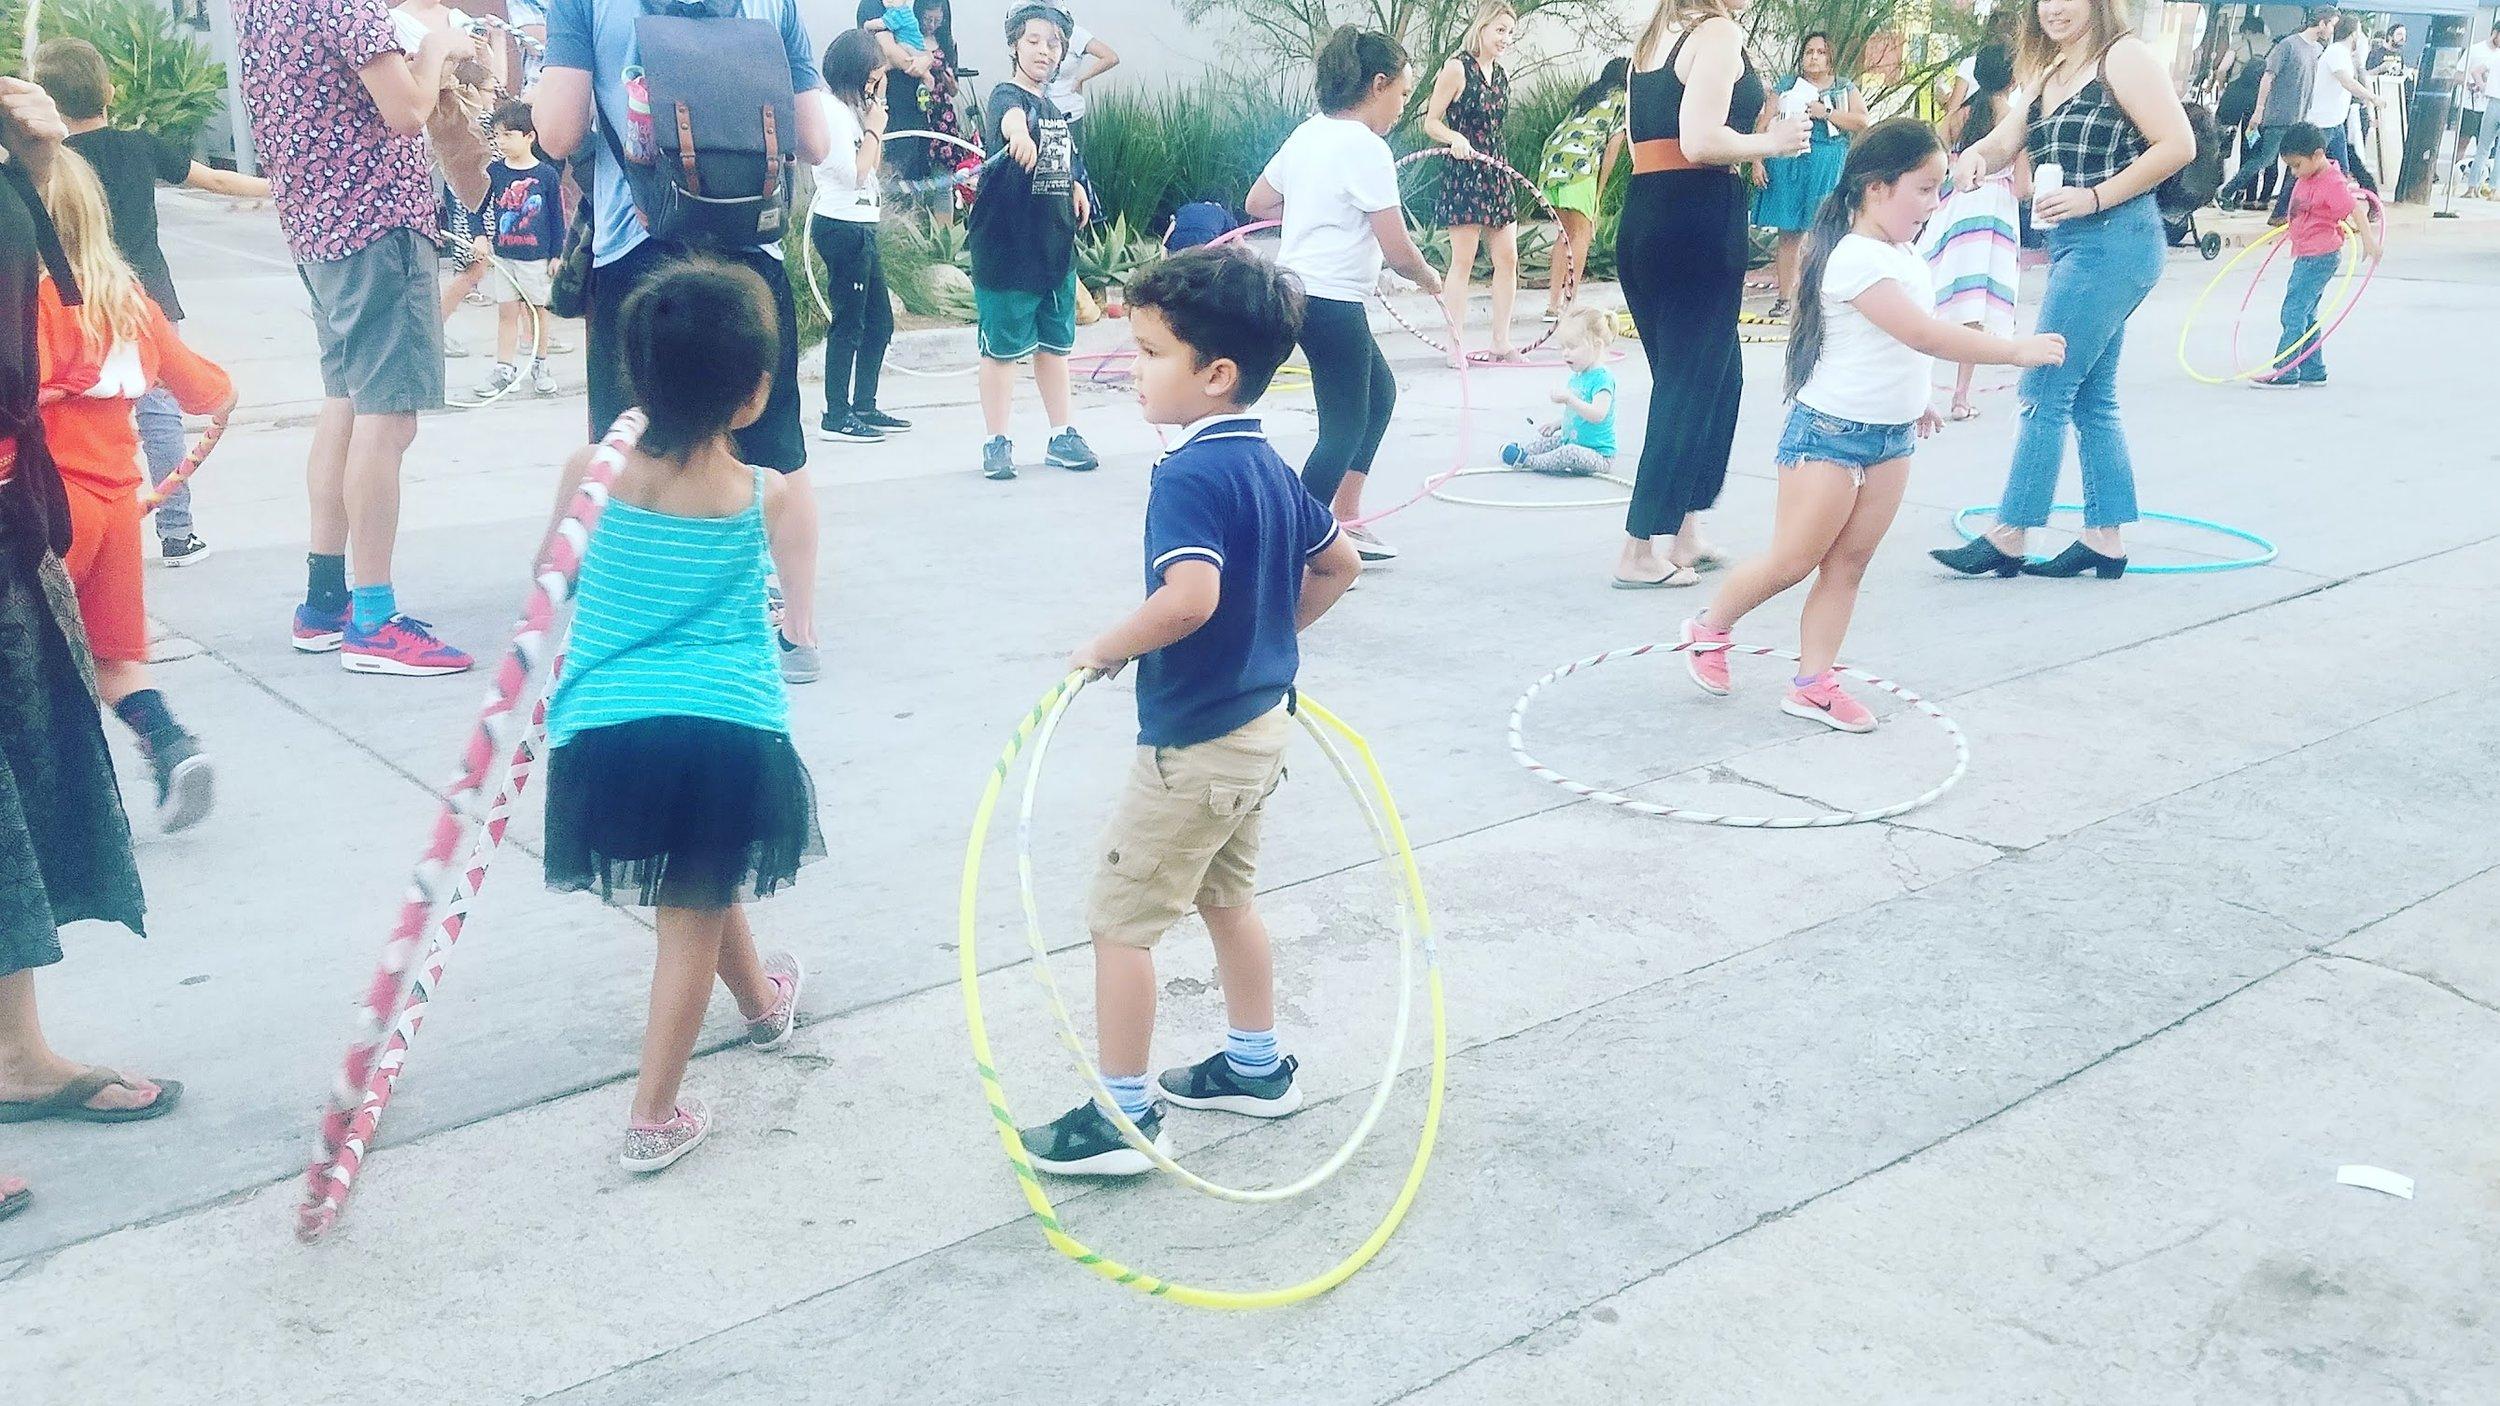 Hula hooping is exercise folks!